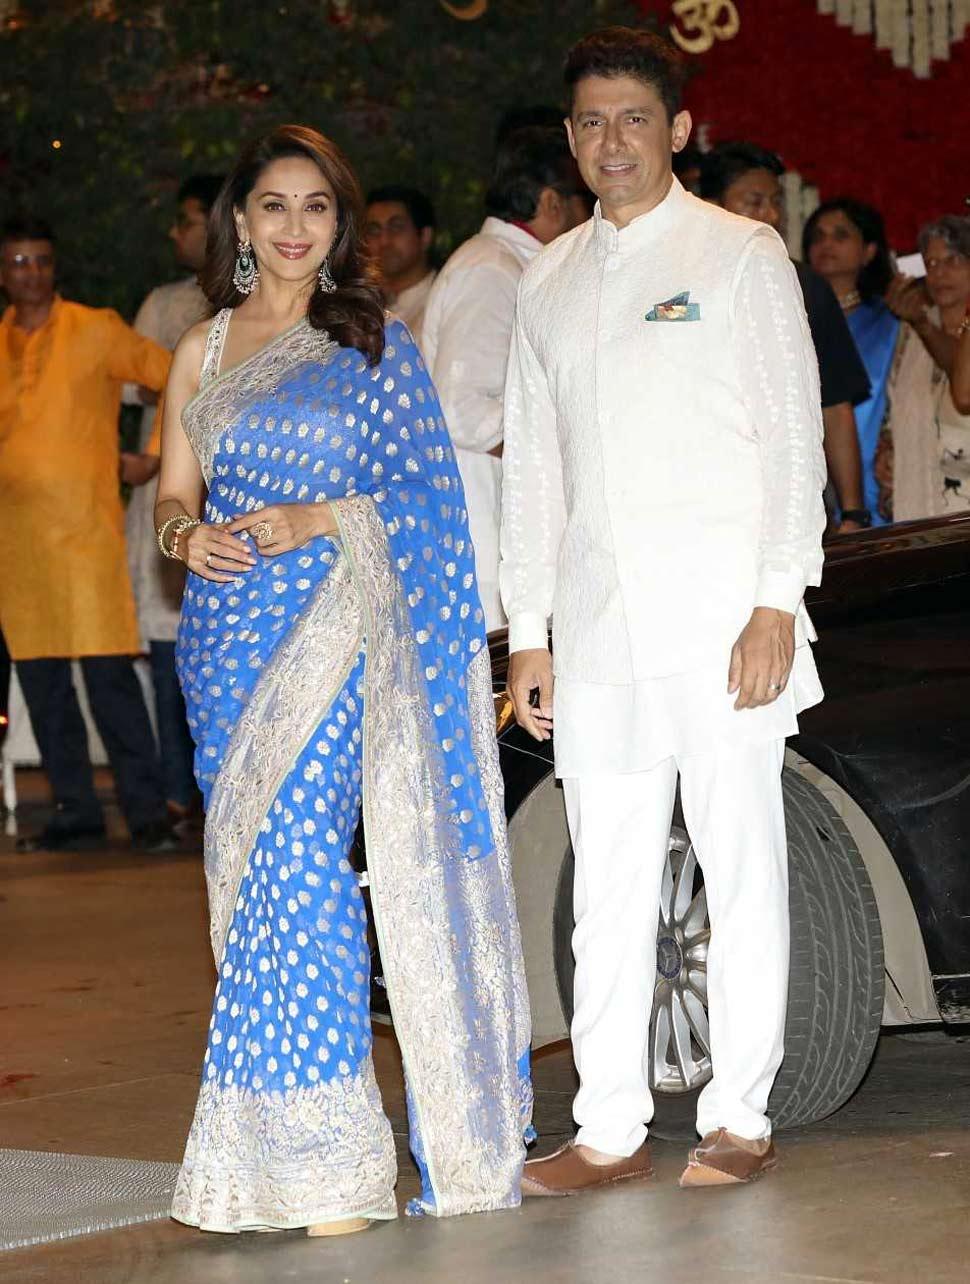 Madhuri Dixit with husband Sriram Nane